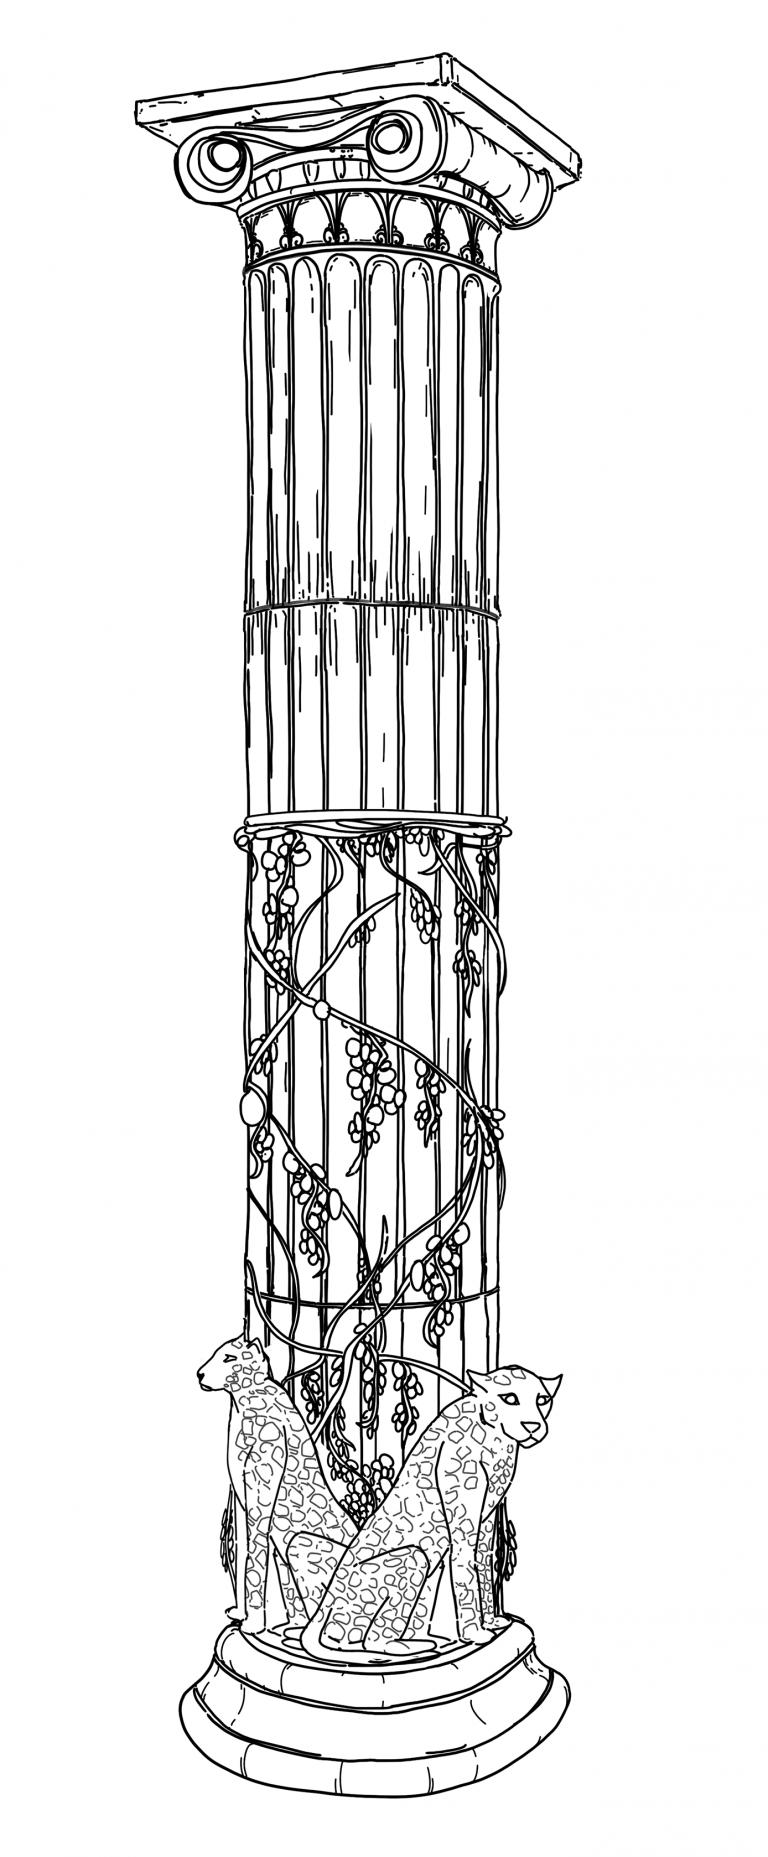 The Column of Dionysus